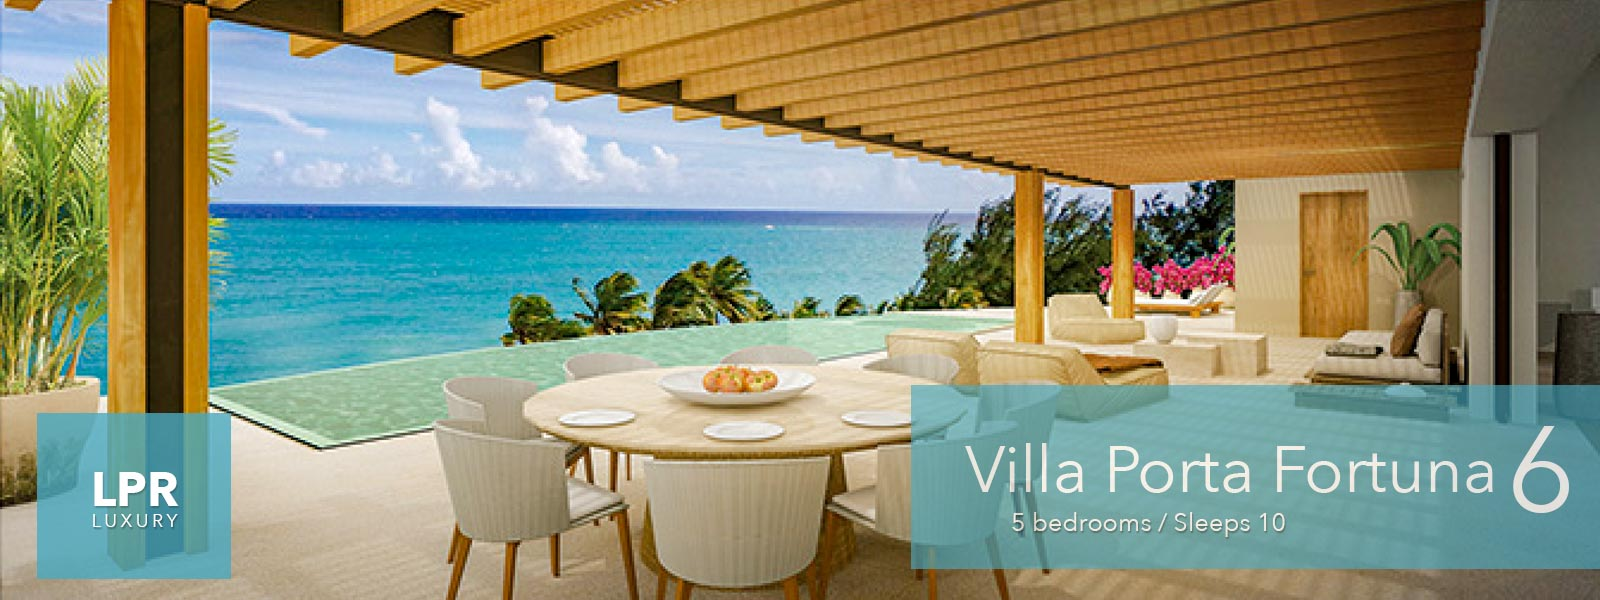 Villa Porta Fortuna 6 - Luxury oceanfront real estate for sale at the Punta Mita Resort, Riviera Nayarit, Mexico